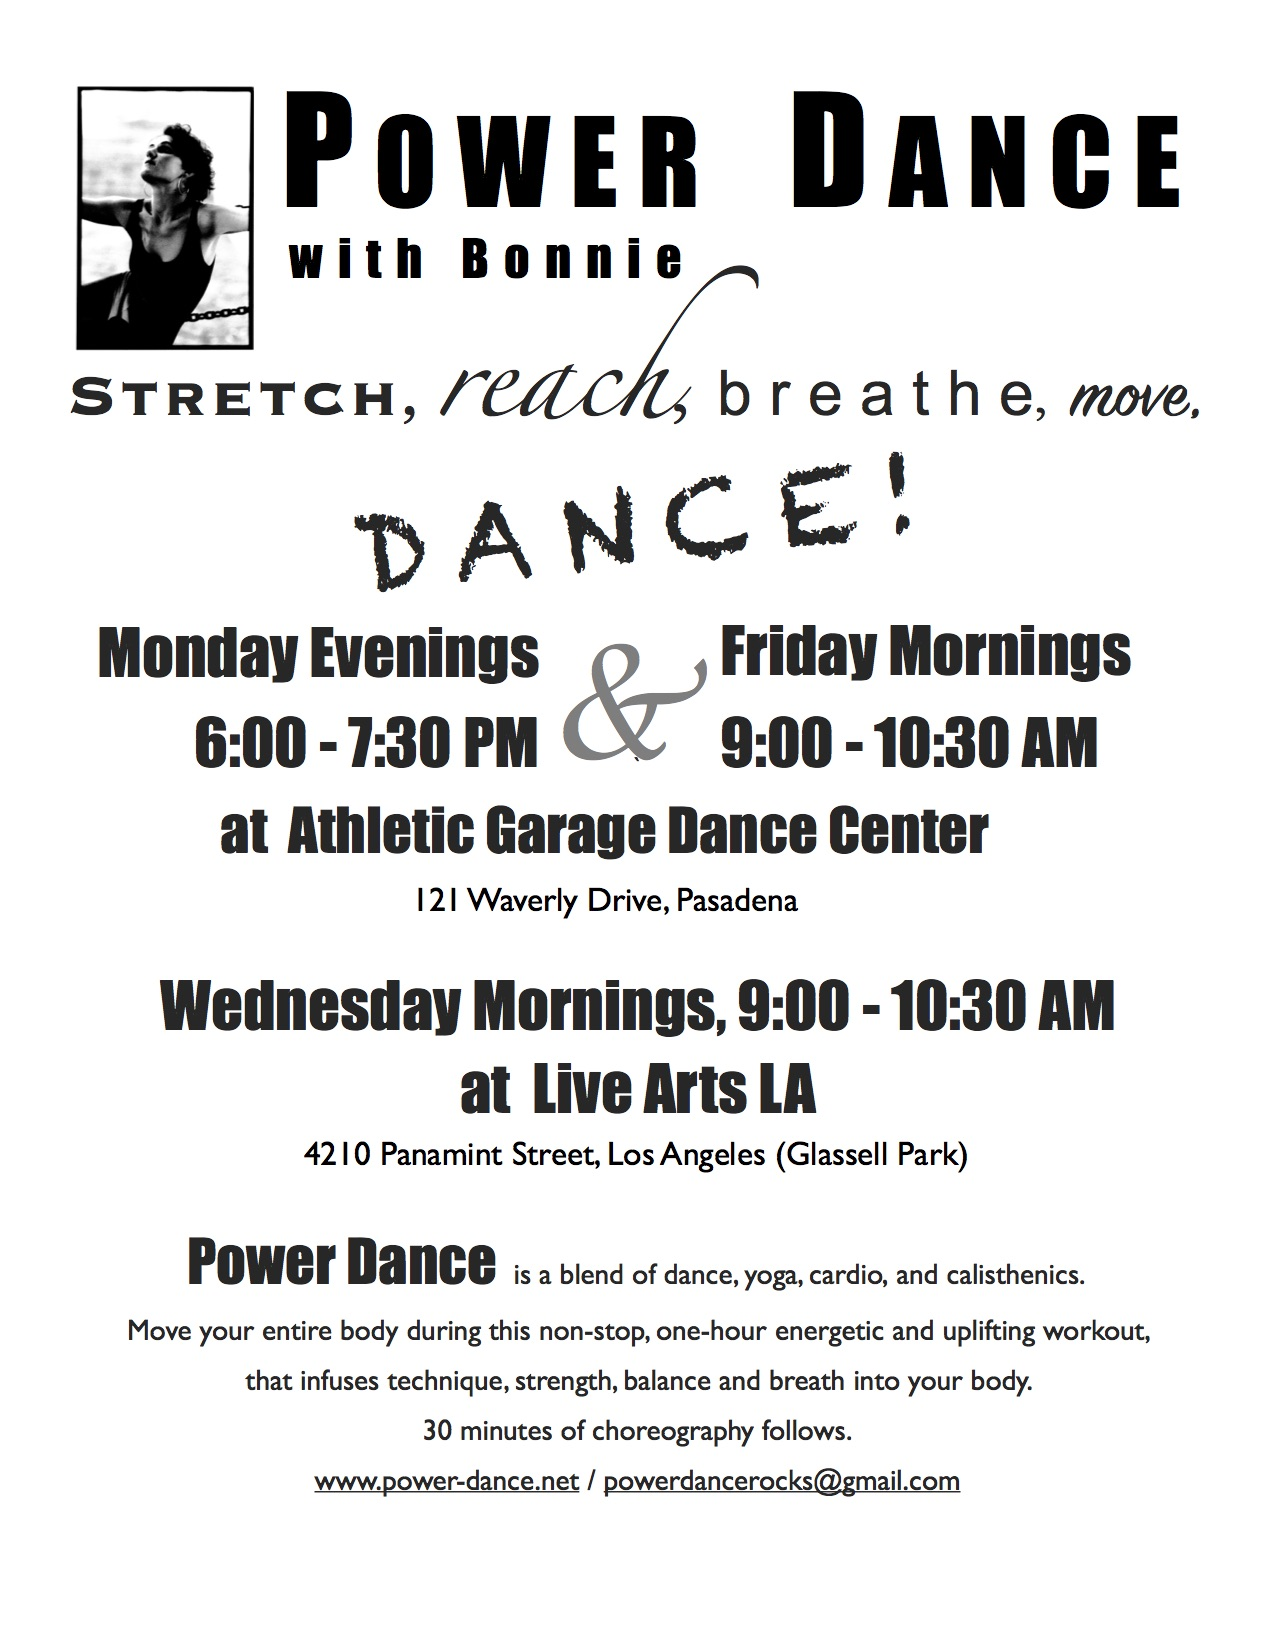 Power Dance Flyer 2016